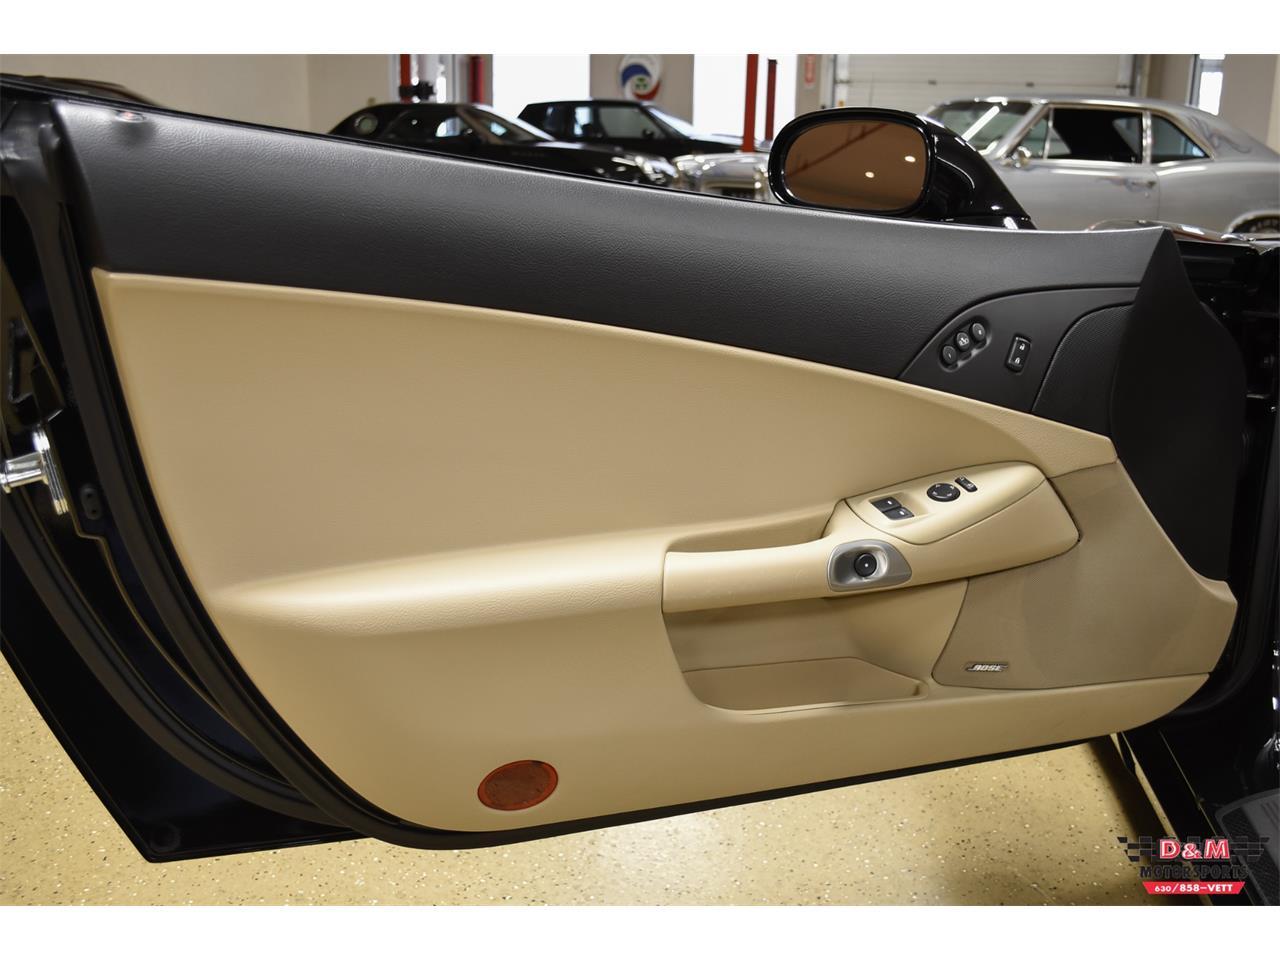 Large Picture of '10 Chevrolet Corvette located in Illinois - $37,995.00 - PUJ0